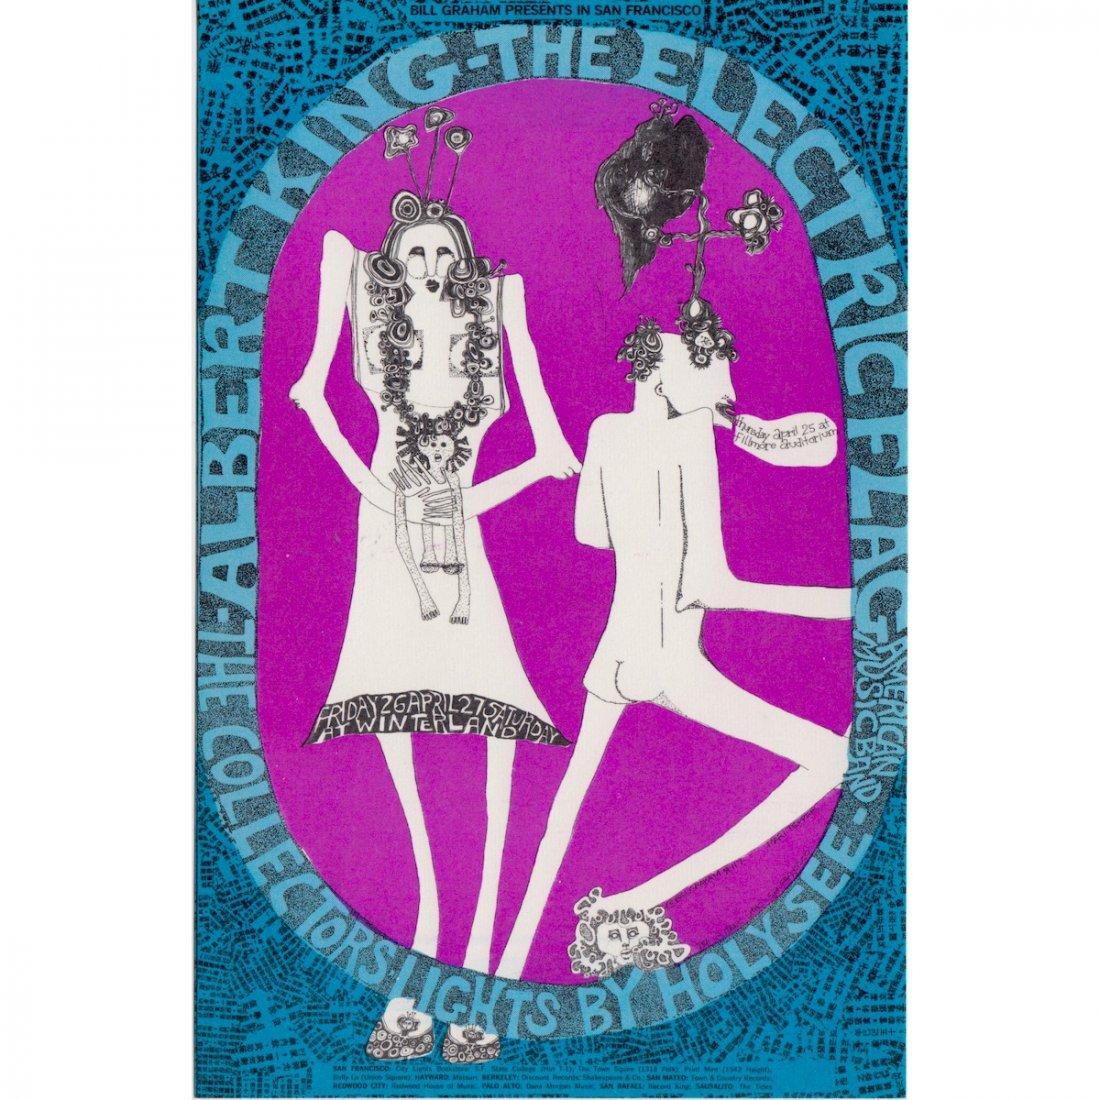 Electric Flag - 1968 Concert Handbill